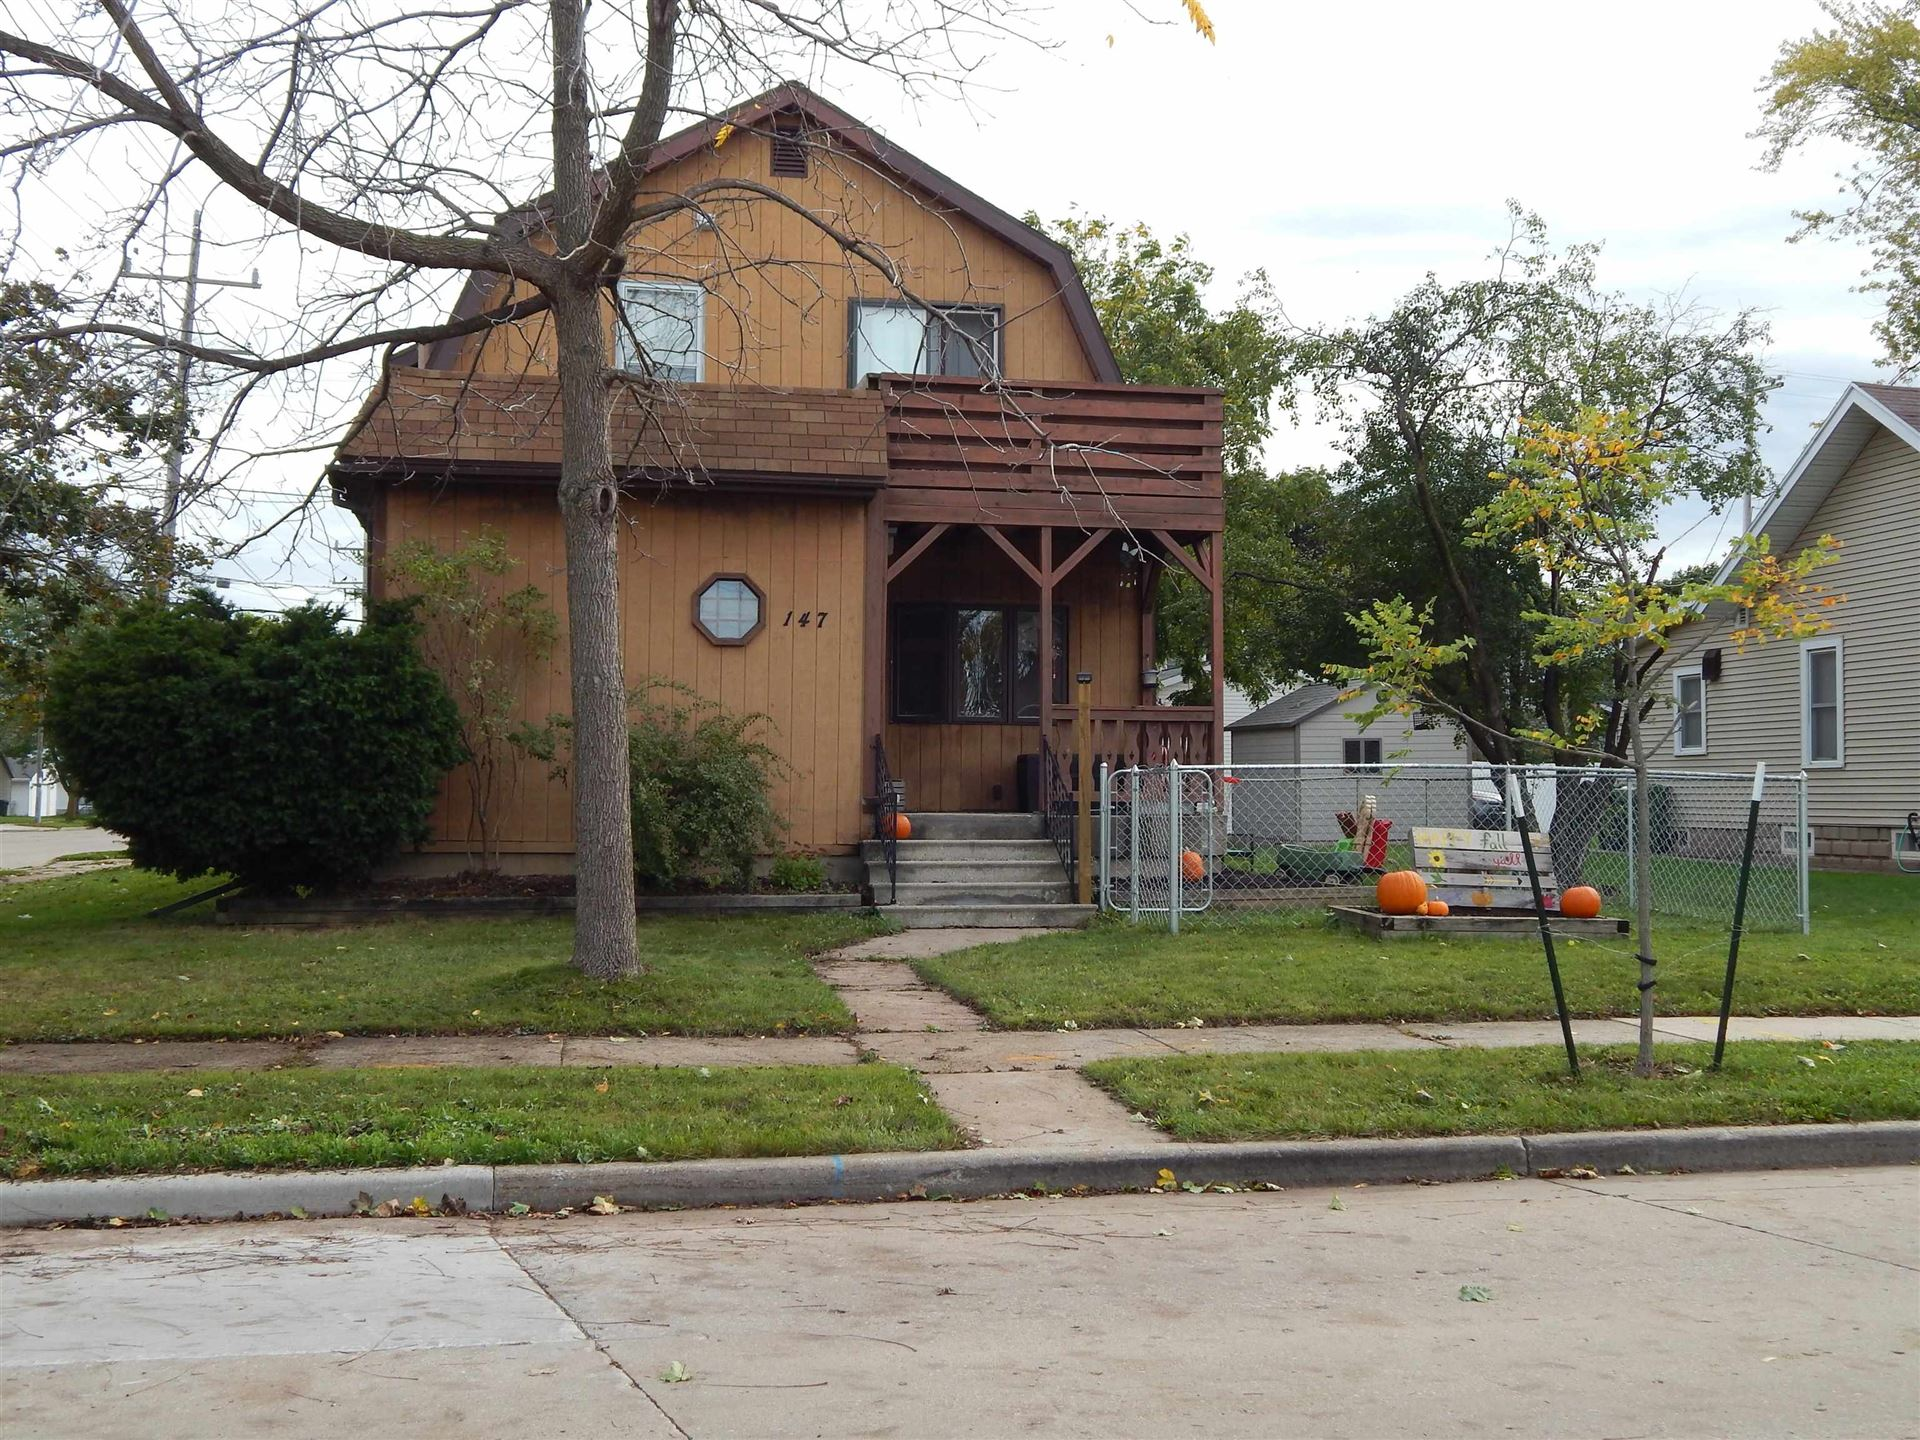 147 N JAMES Street, Kimberly, WI 54136 - MLS#: 50249743